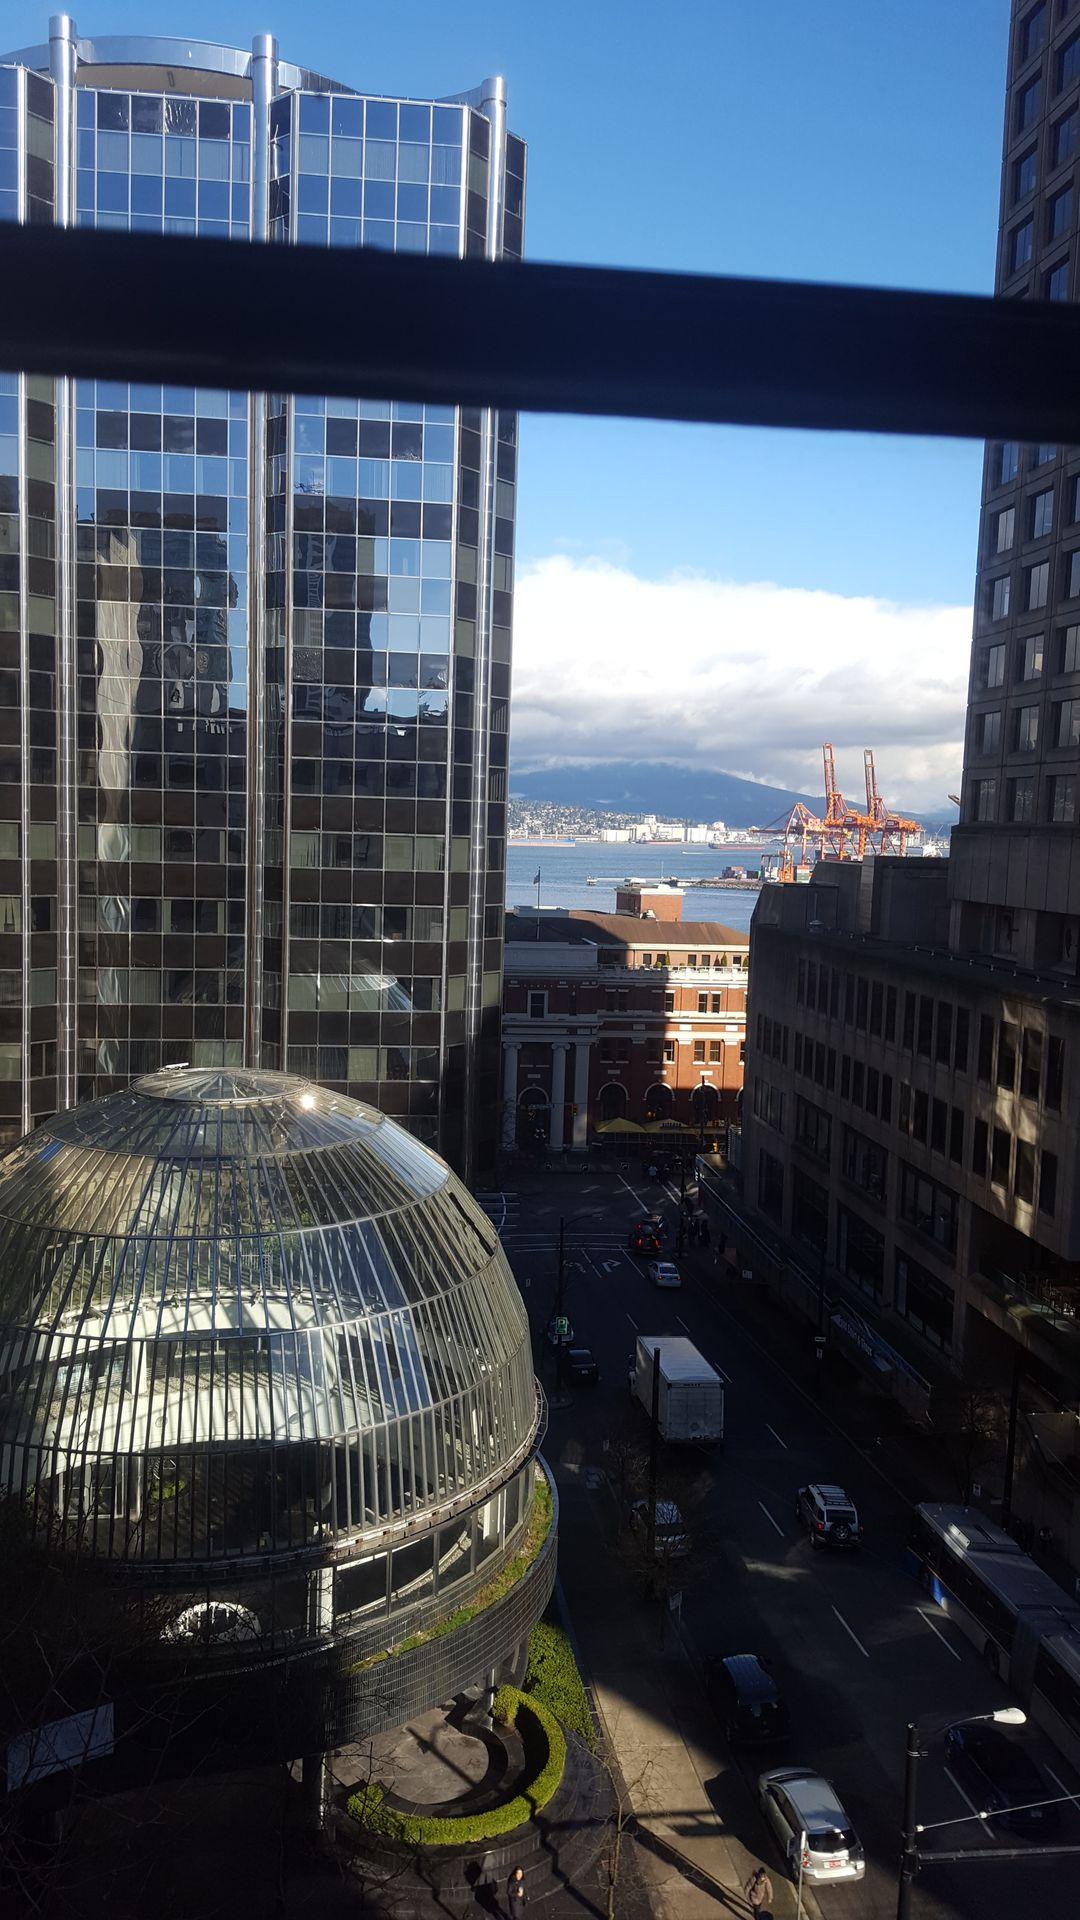 Vancouver Ausblick Beim Bewerbungen Schreiben Vakantio